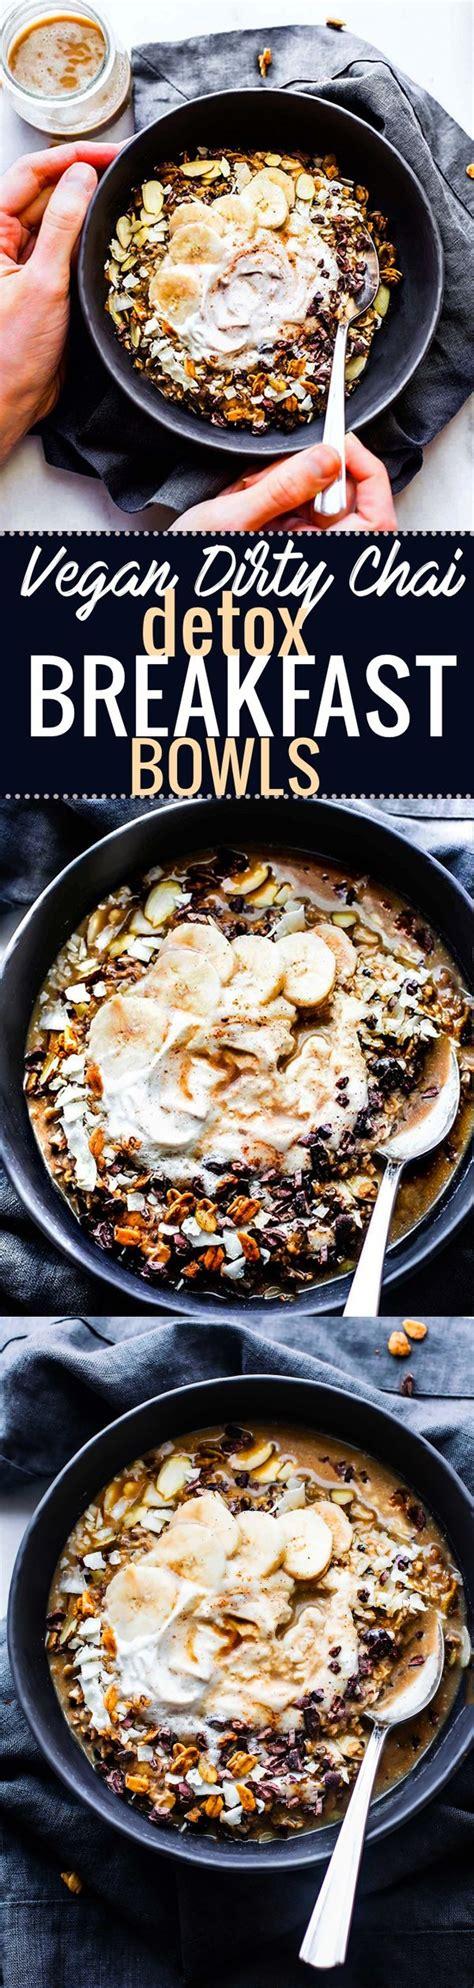 Gluten Detox Time by Vegan Chai Detox Breakfast Bowls Gluten Free